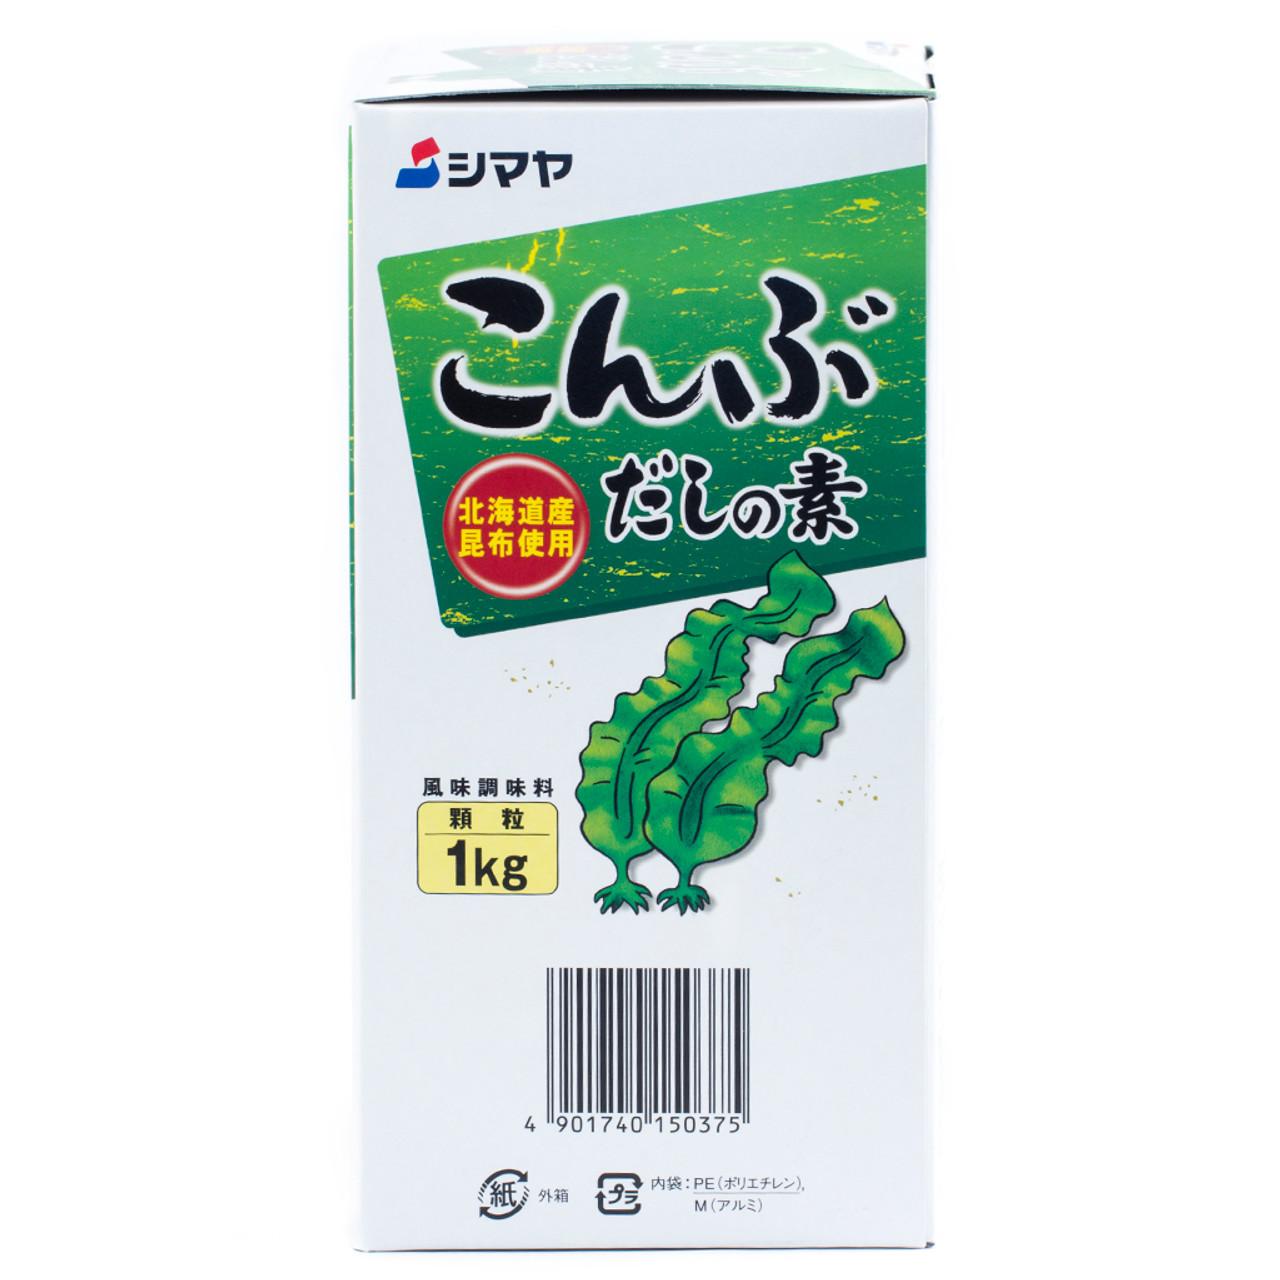 SHIMAYA KONBUDASHI SOUP STOCK 1kg